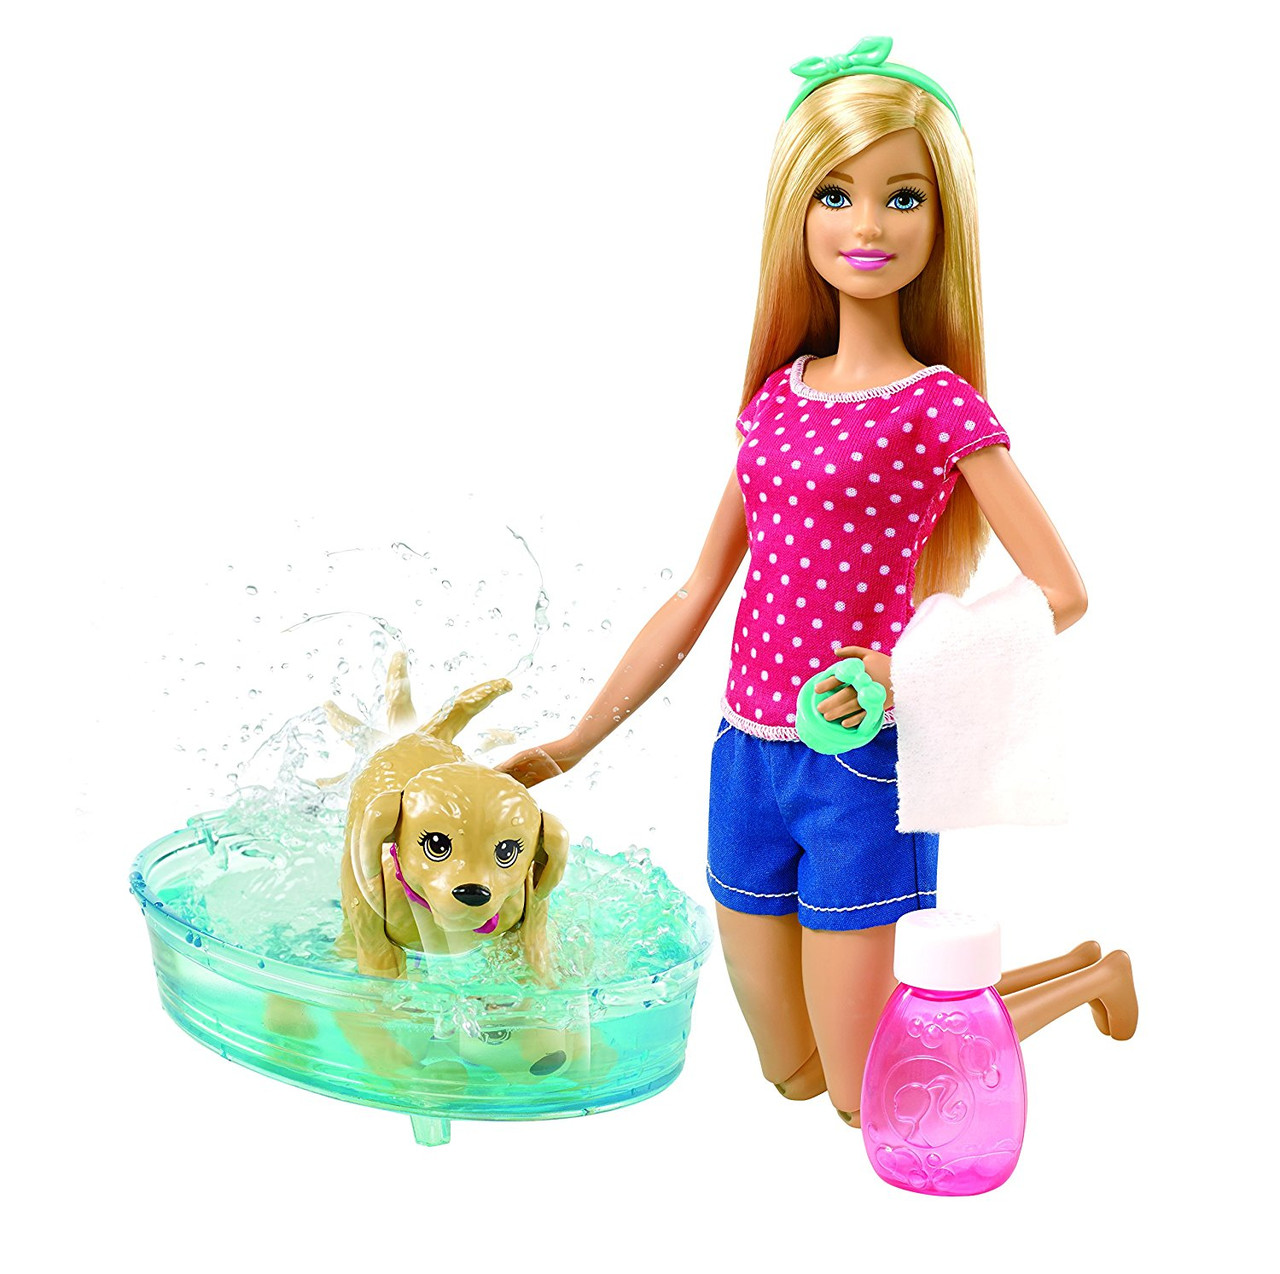 Кукла Барби Веселое купание щенка Barbie Splish Splash Pup Playset